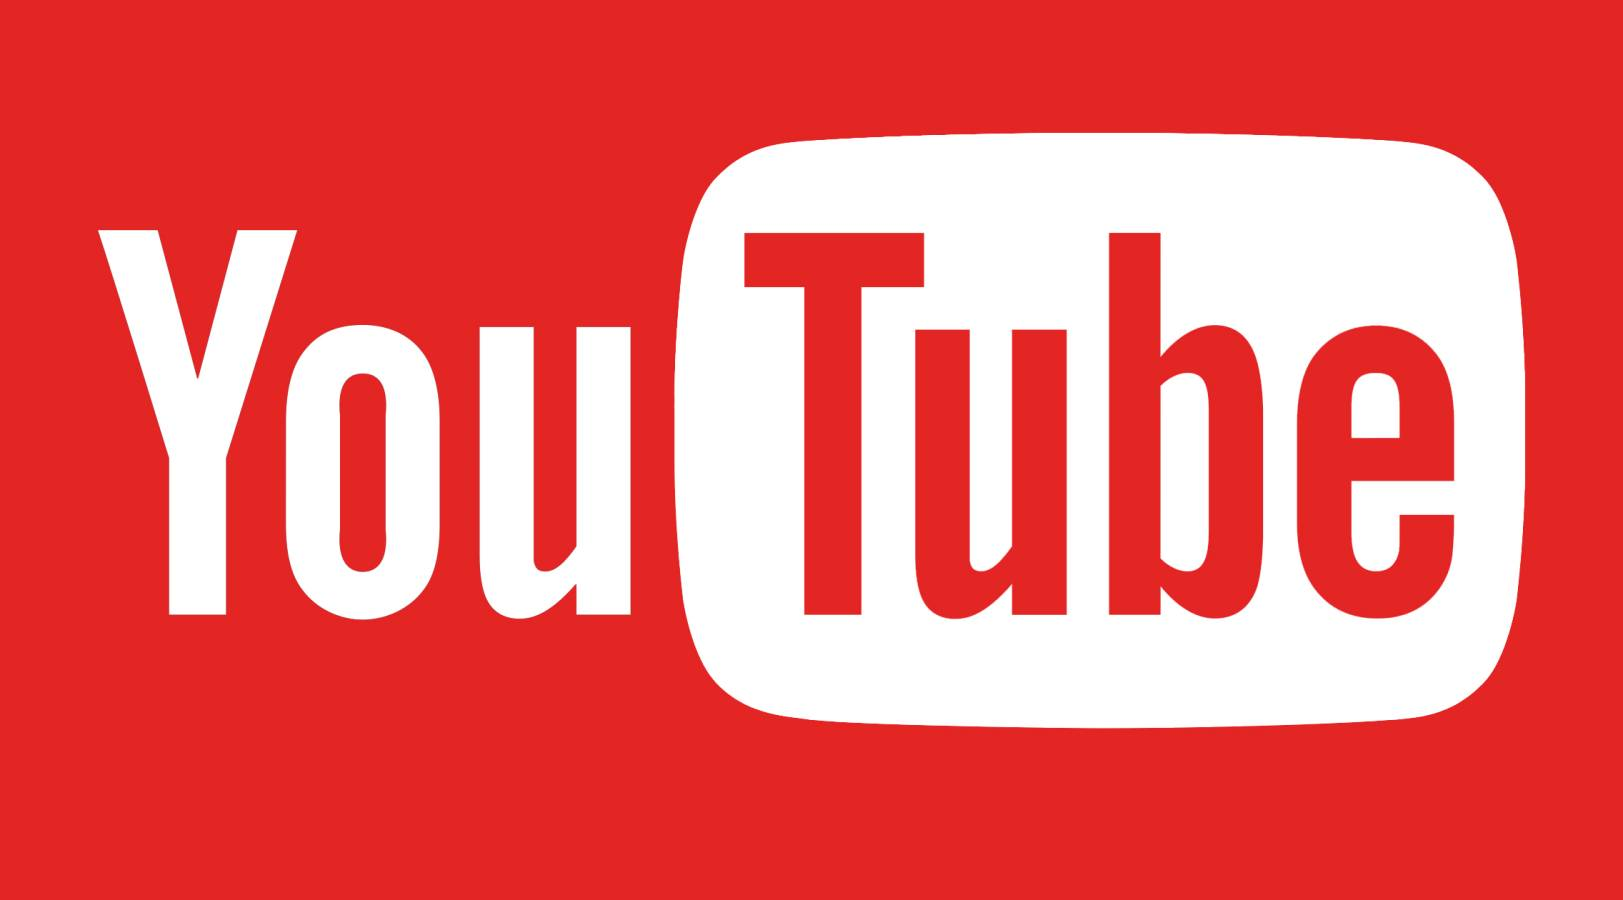 YouTube Update Nou Aplicatia Telefoanelor Tabletelor